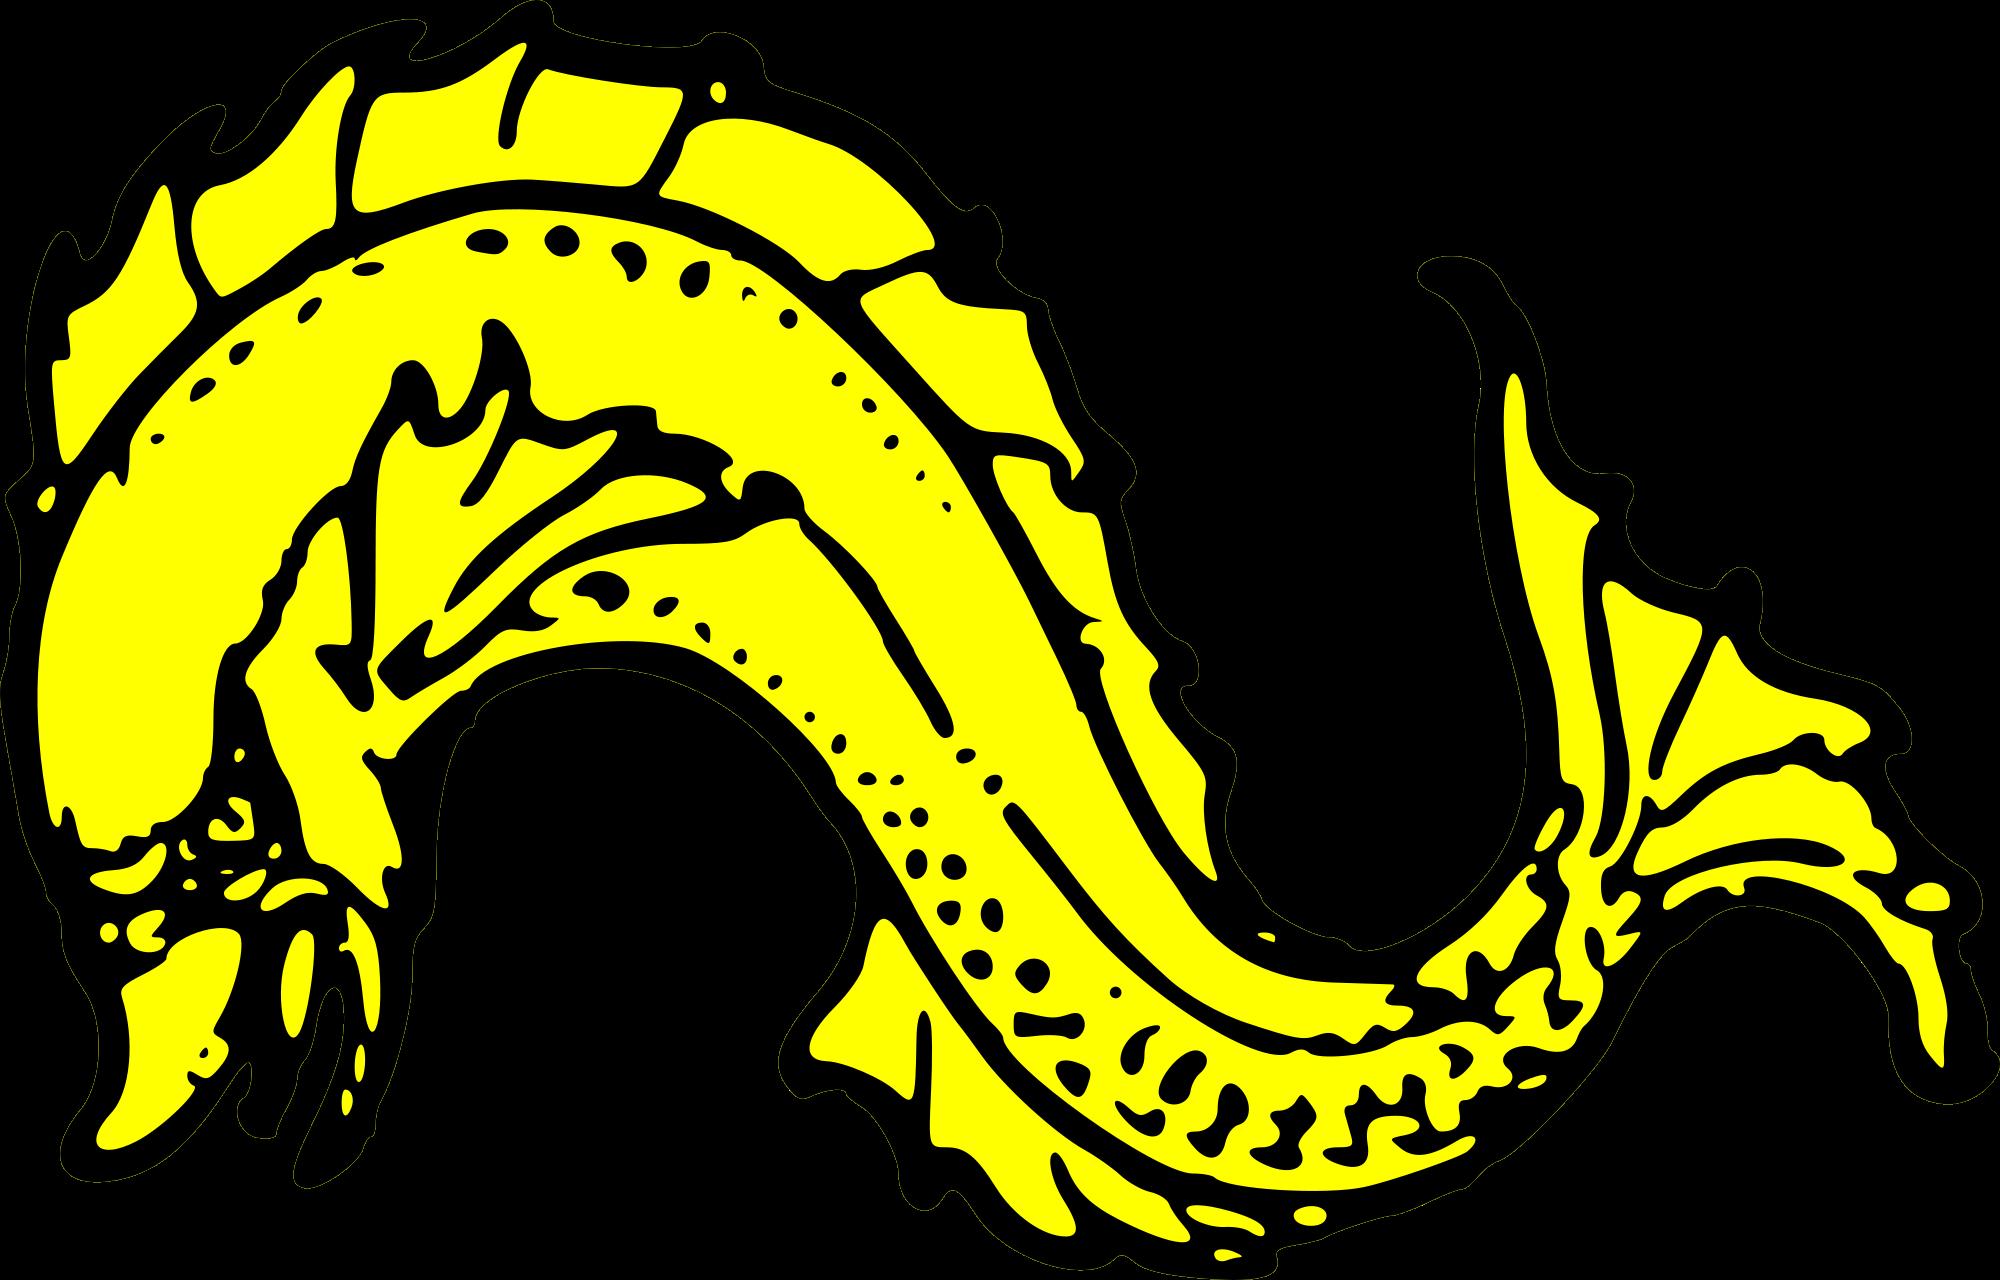 Clipart dolphin svg. File naiant heraldry wikimedia